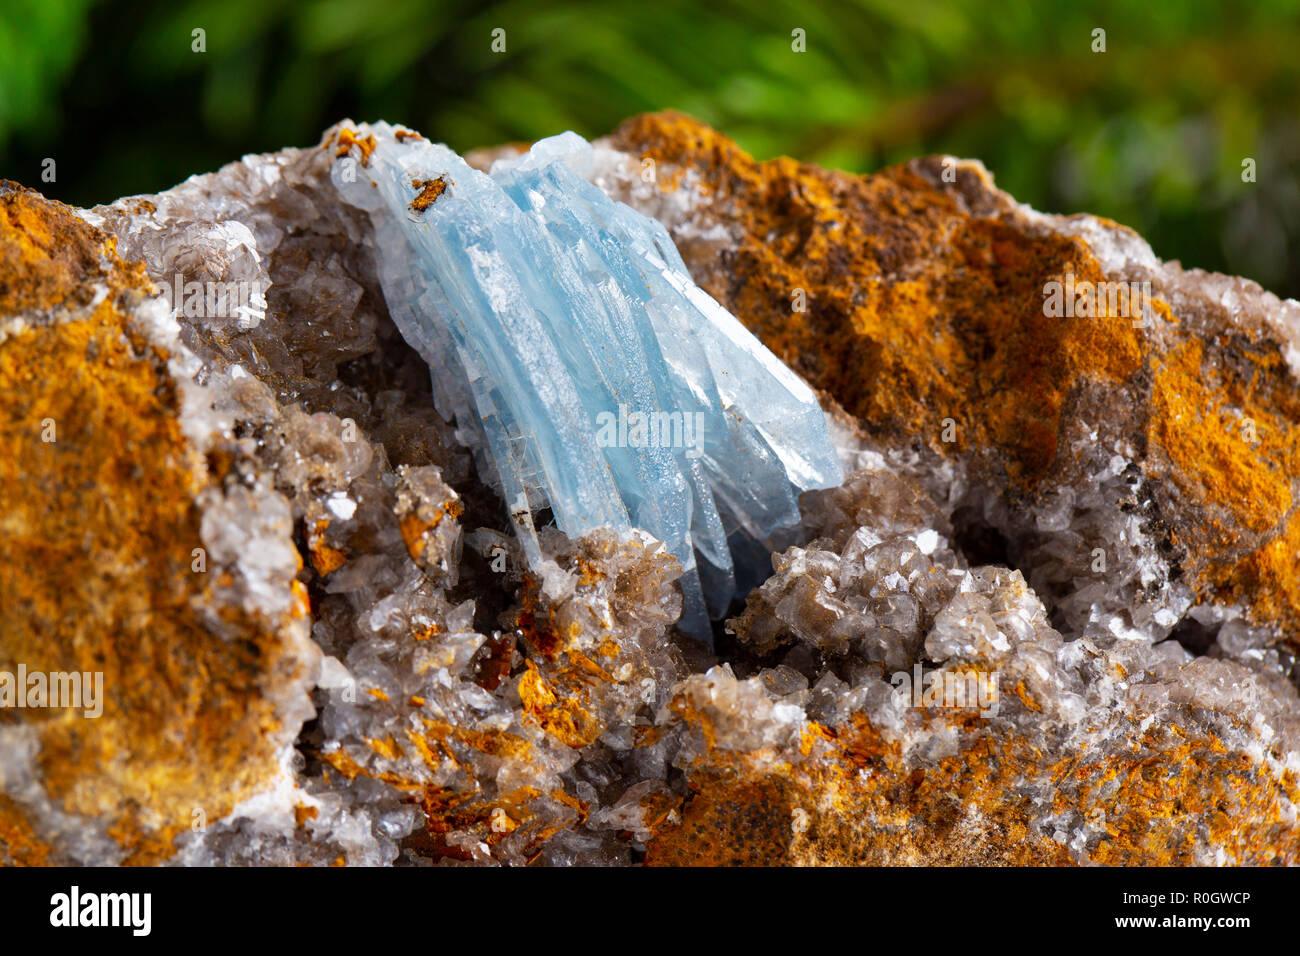 Barite on Calcite, Stoneham, weld County, Colorado gem - Stock Image